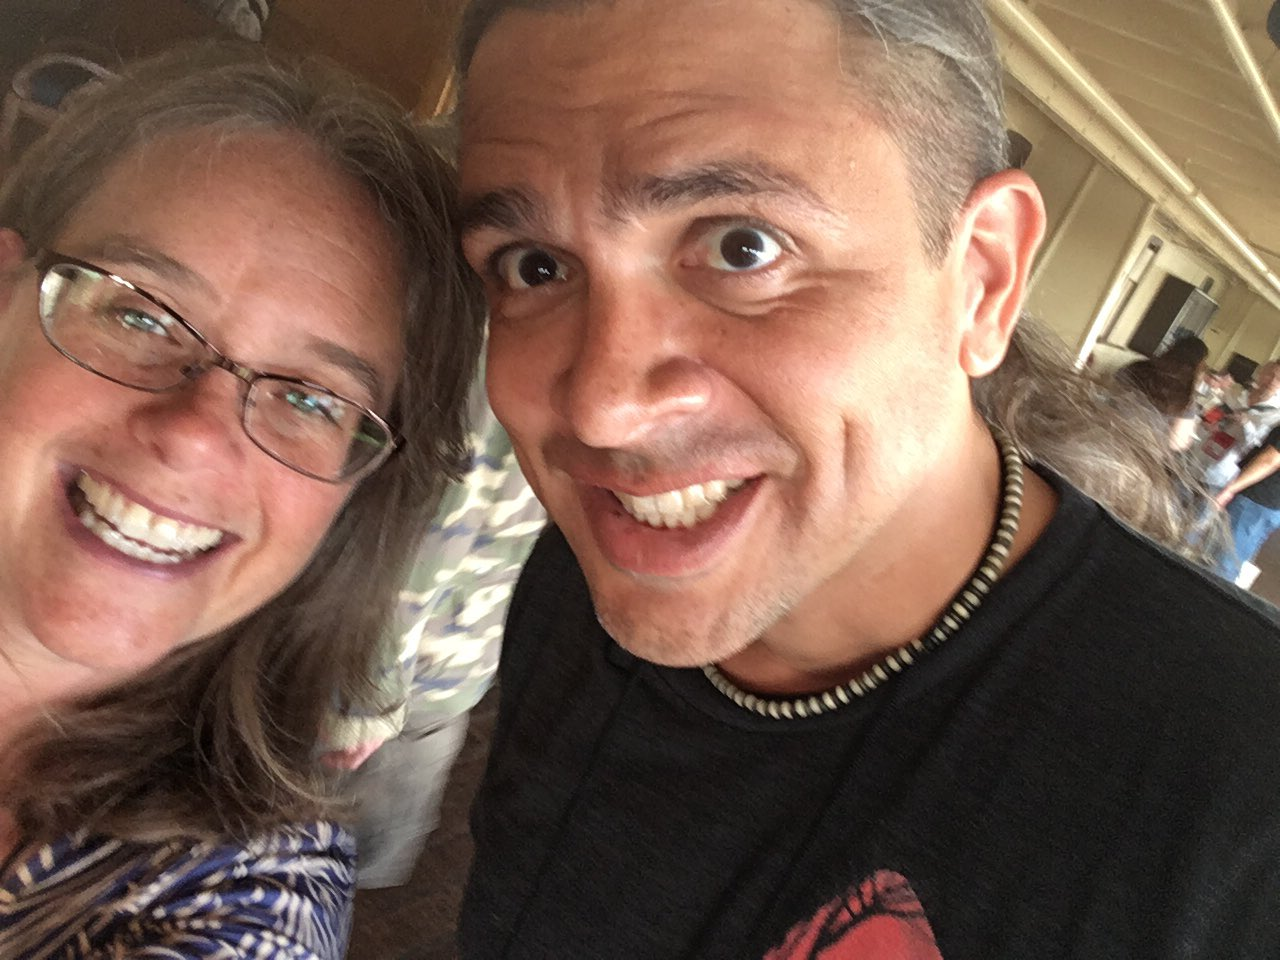 #StokerCon2017 selfies with @SGJ72 https://t.co/gr8IYZksHP